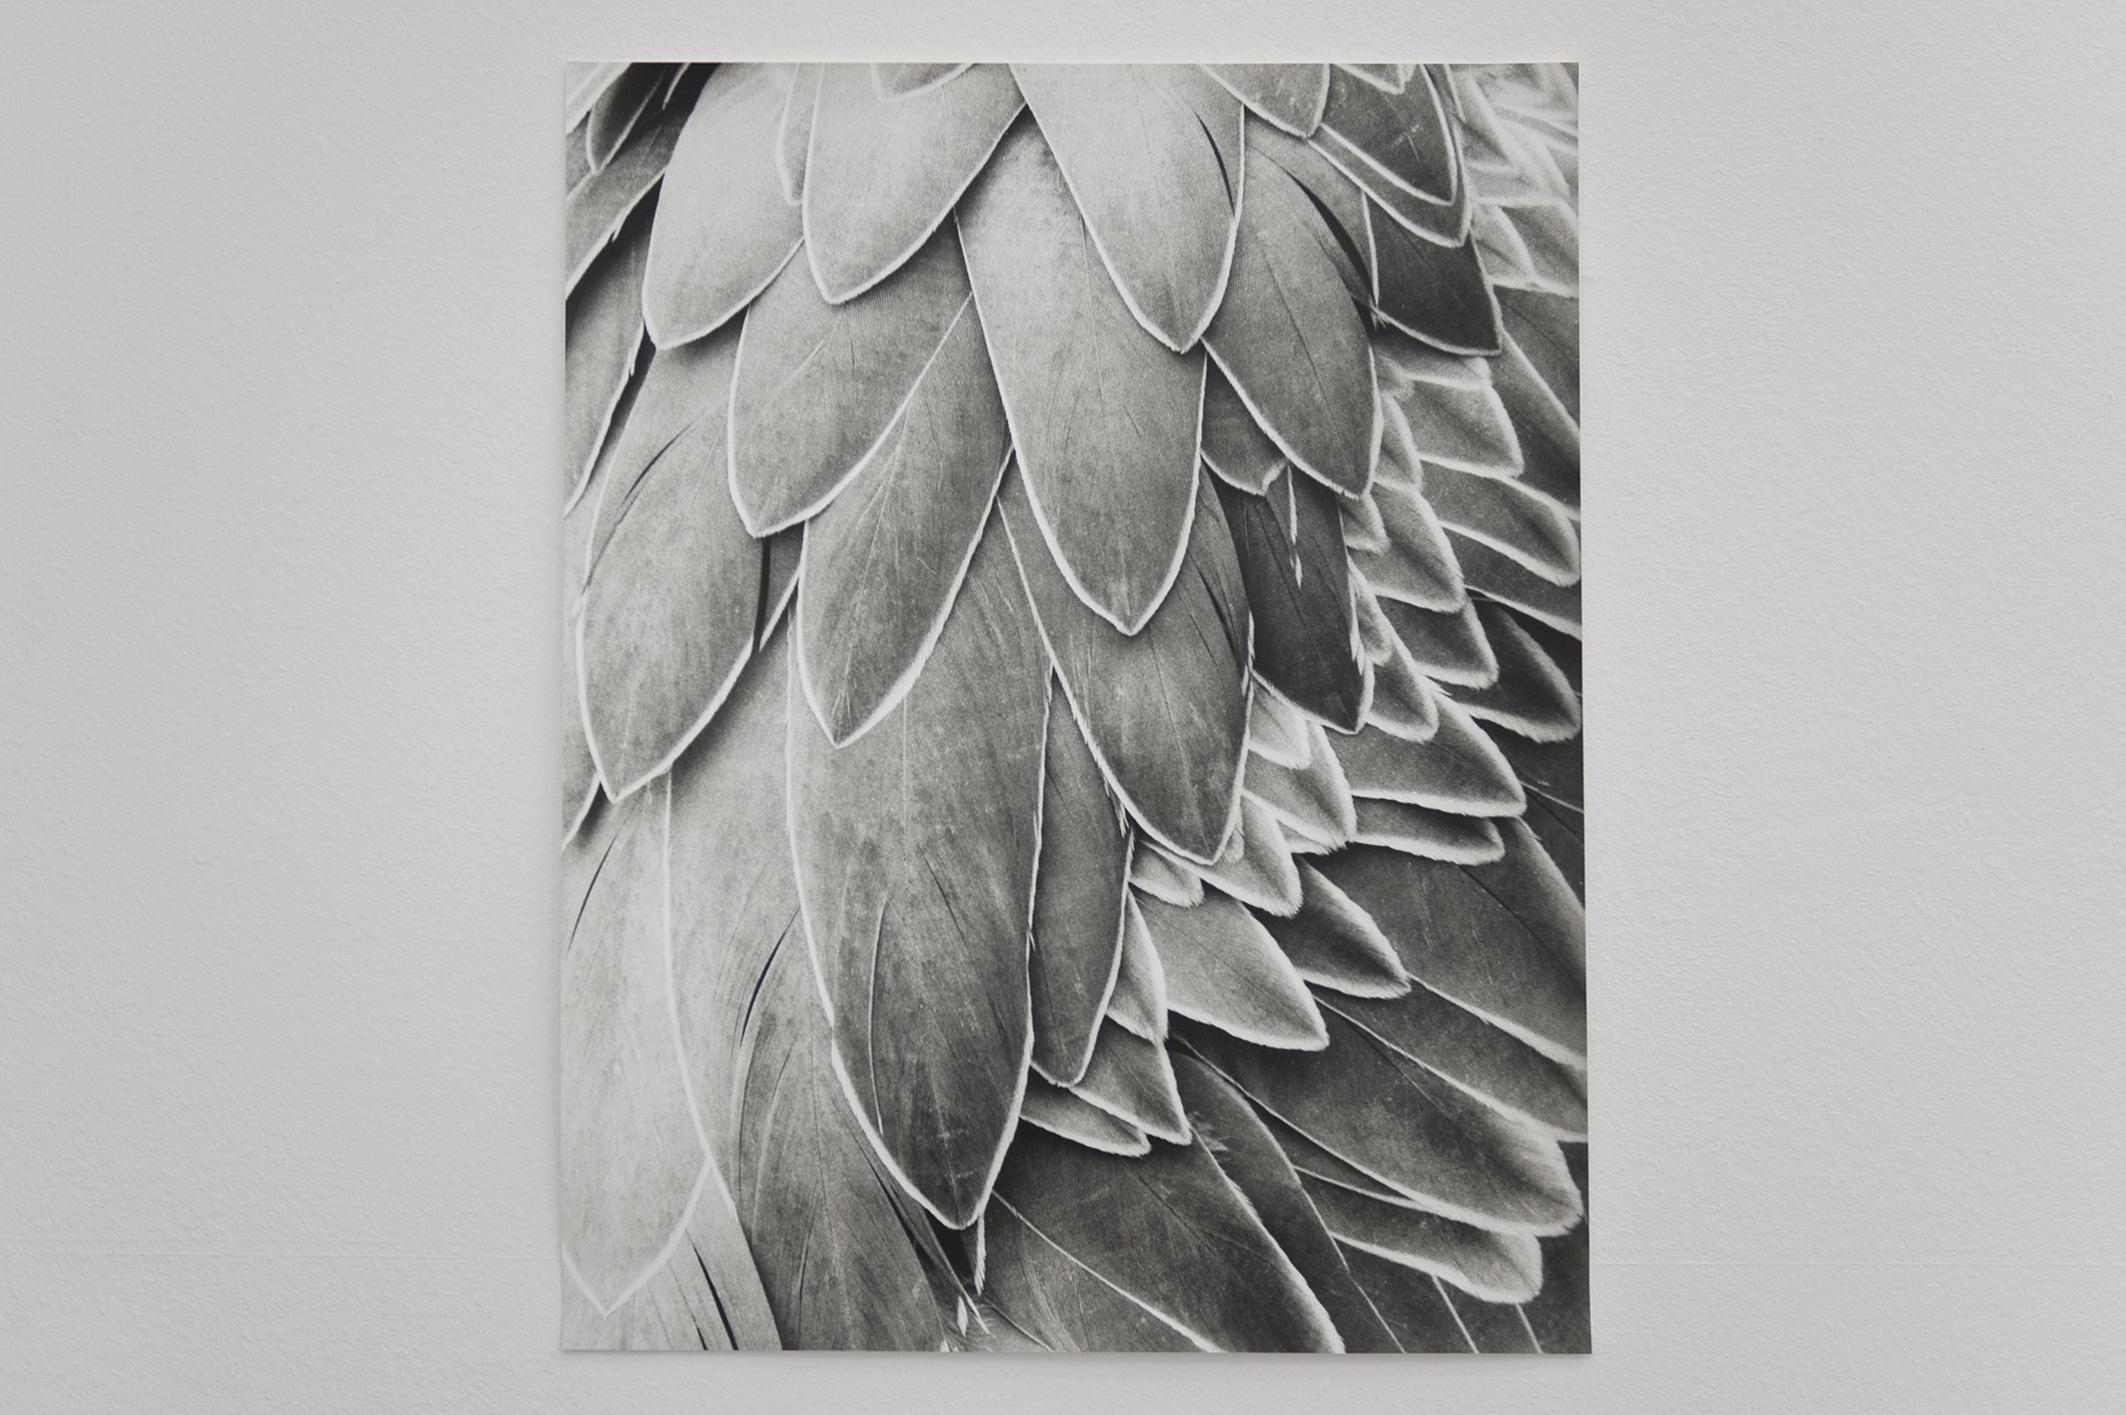 Untitled (Feathers), 2014 | Jochen Lempert | ProjecteSD